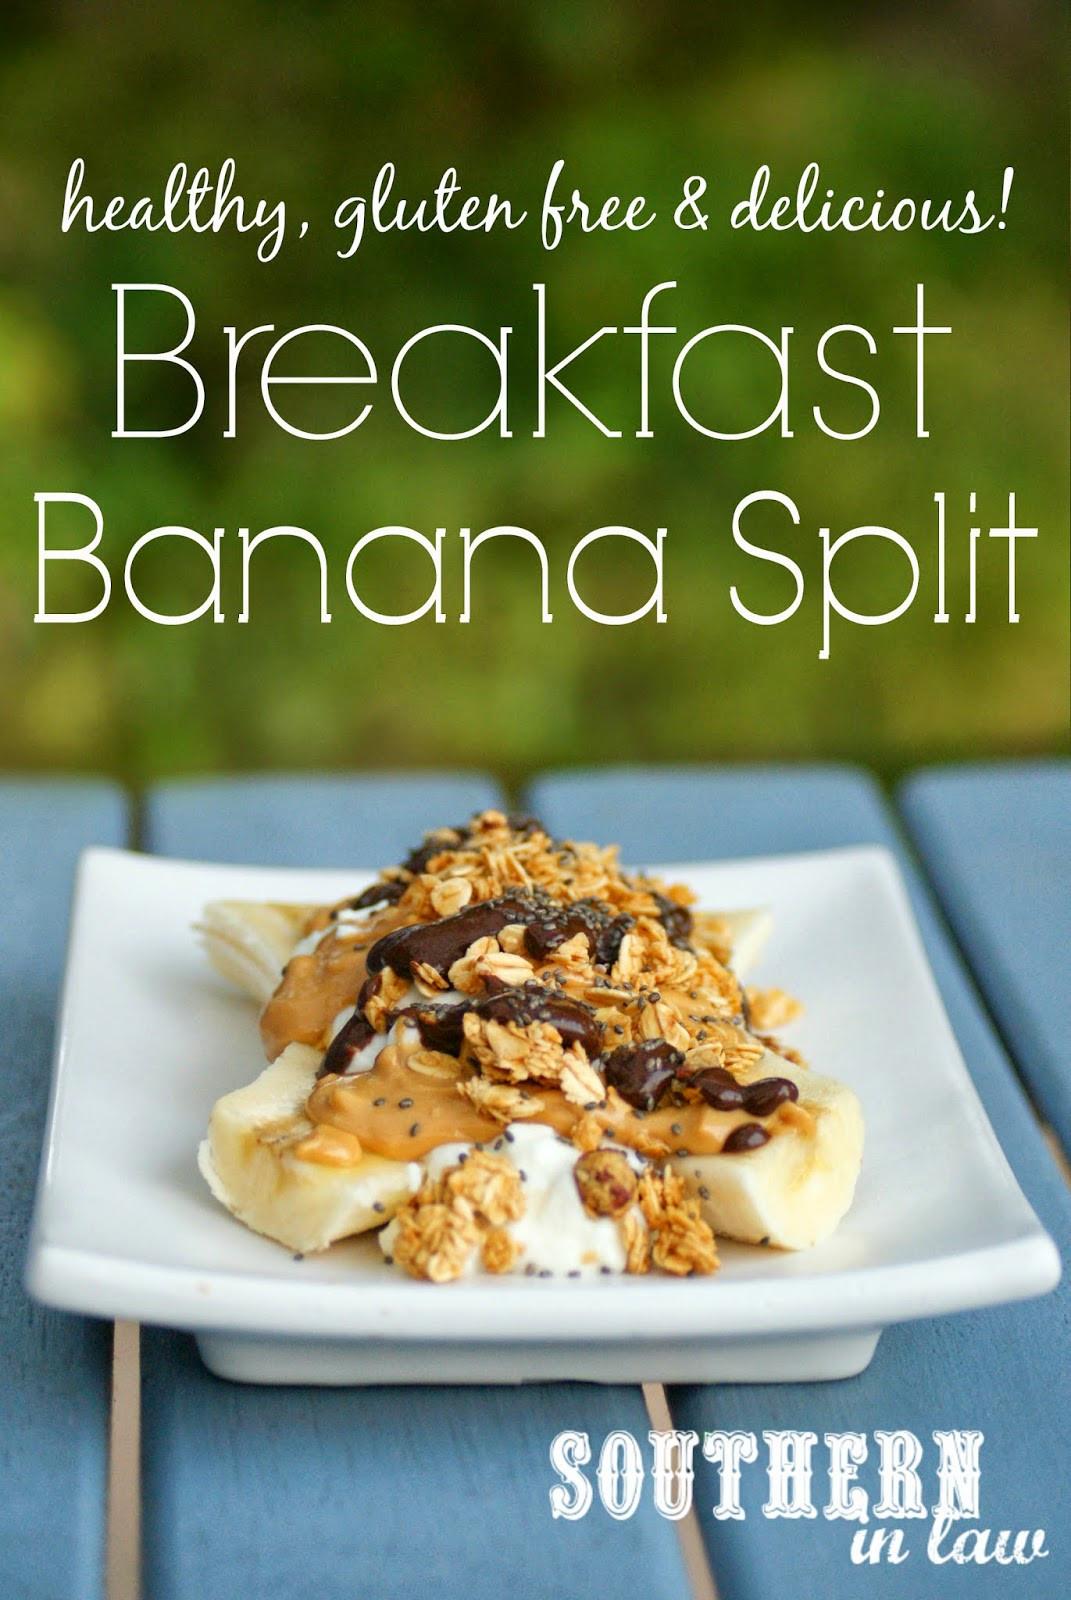 Healthy Banana Recipes For Breakfast  Southern In Law Recipe Breakfast Banana Split